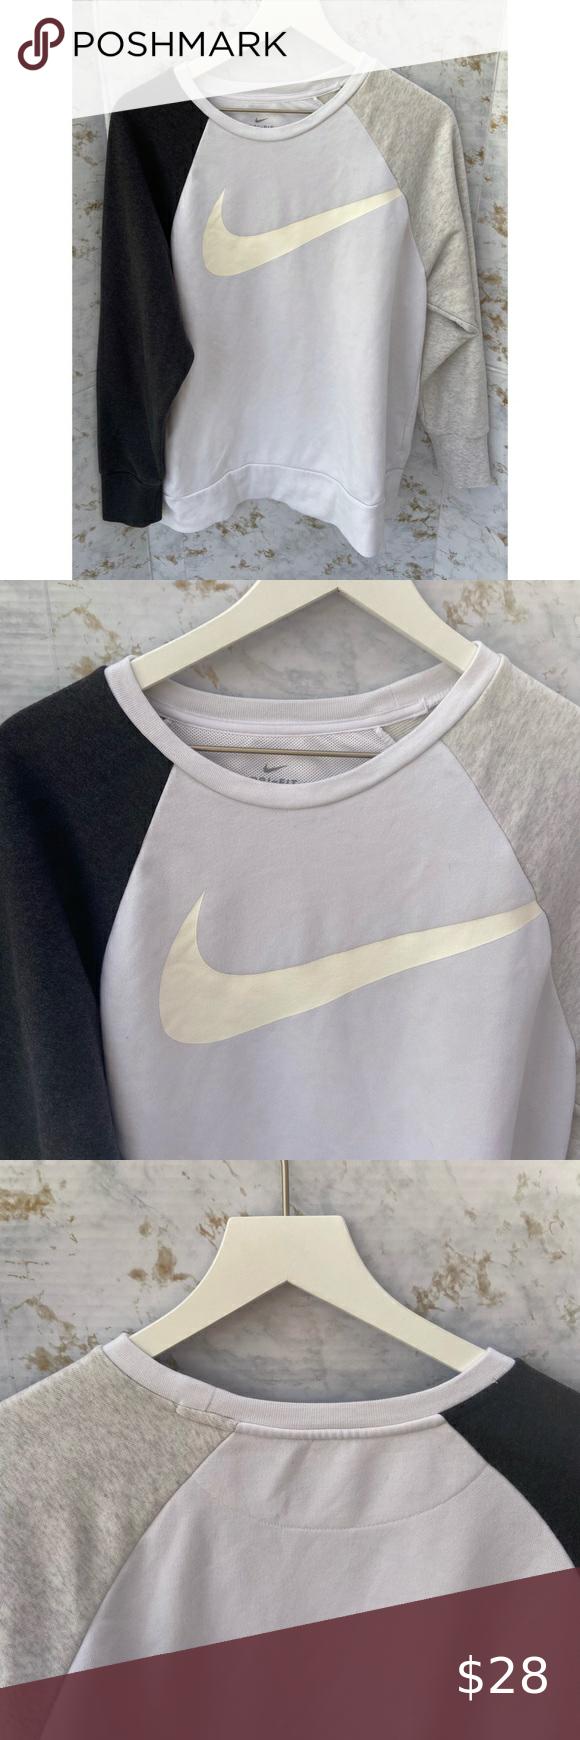 Nike Dri Fit Tri Color Crewneck Nike Crewneck Sweatshirt Like New Condition Size Medium Gray Black And Nike Crewneck Sweatshirt Clothes Design Nike Dri Fit [ 1740 x 580 Pixel ]